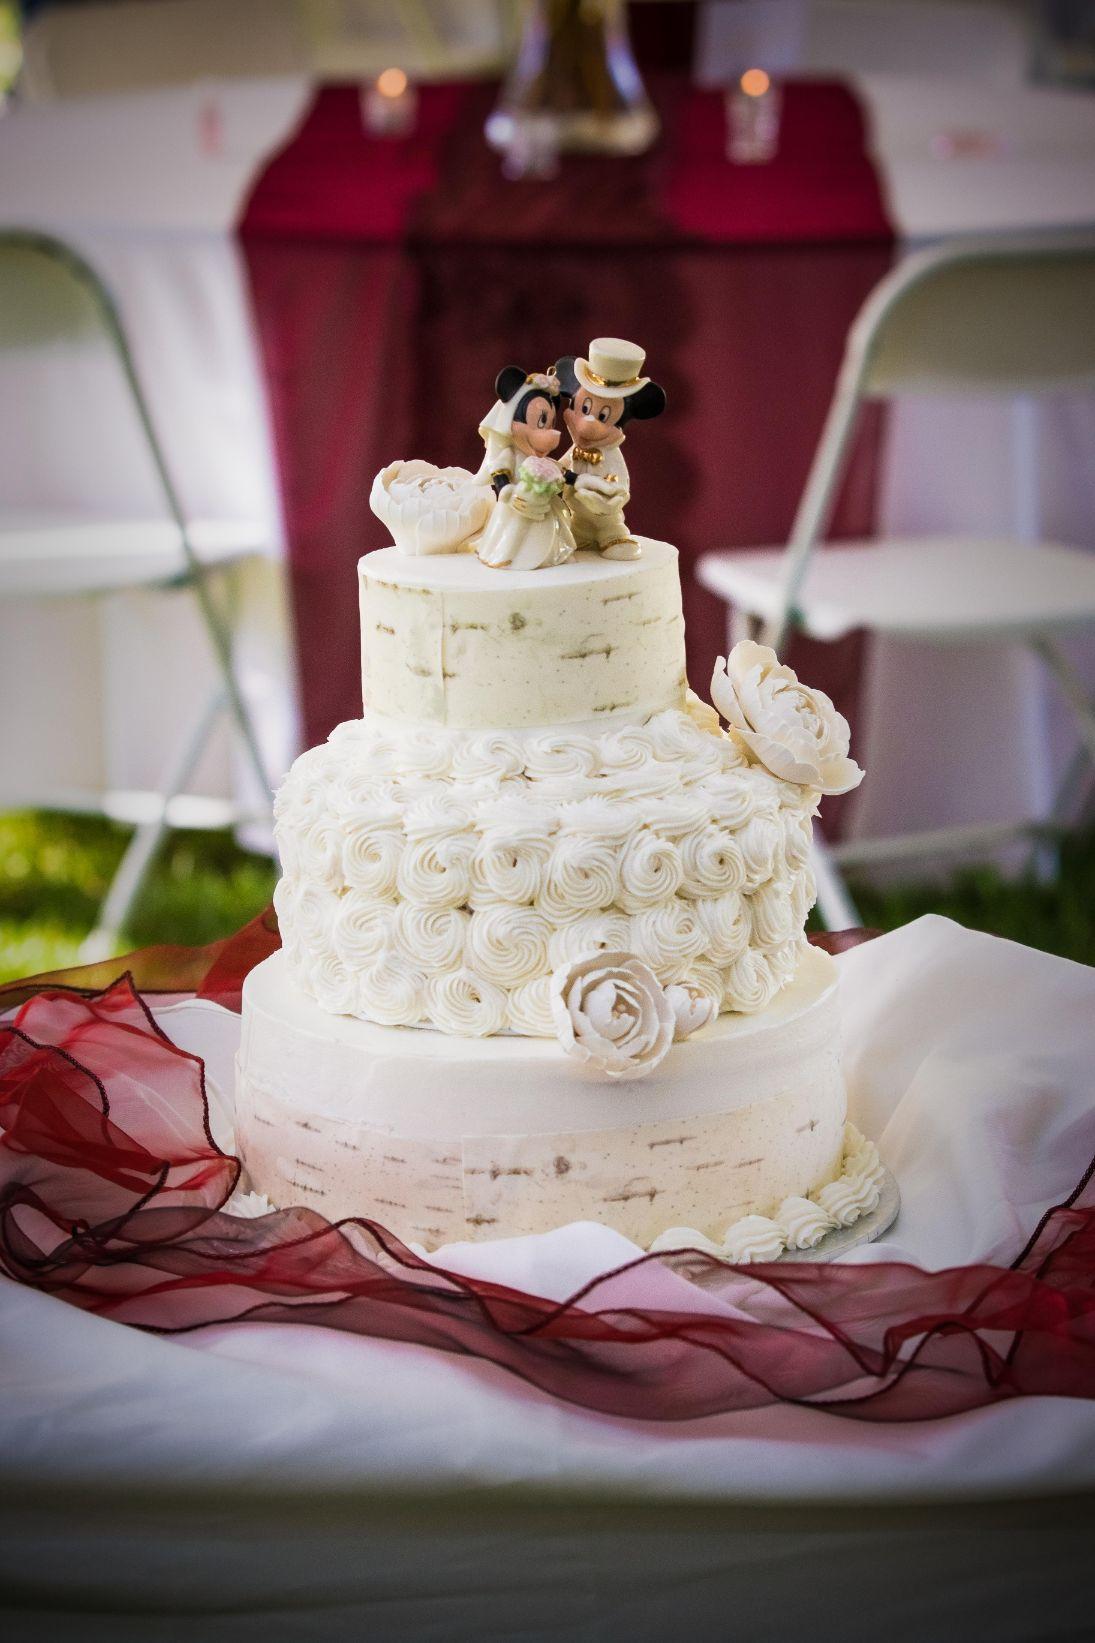 Wedding Cake at outdoor reception 1